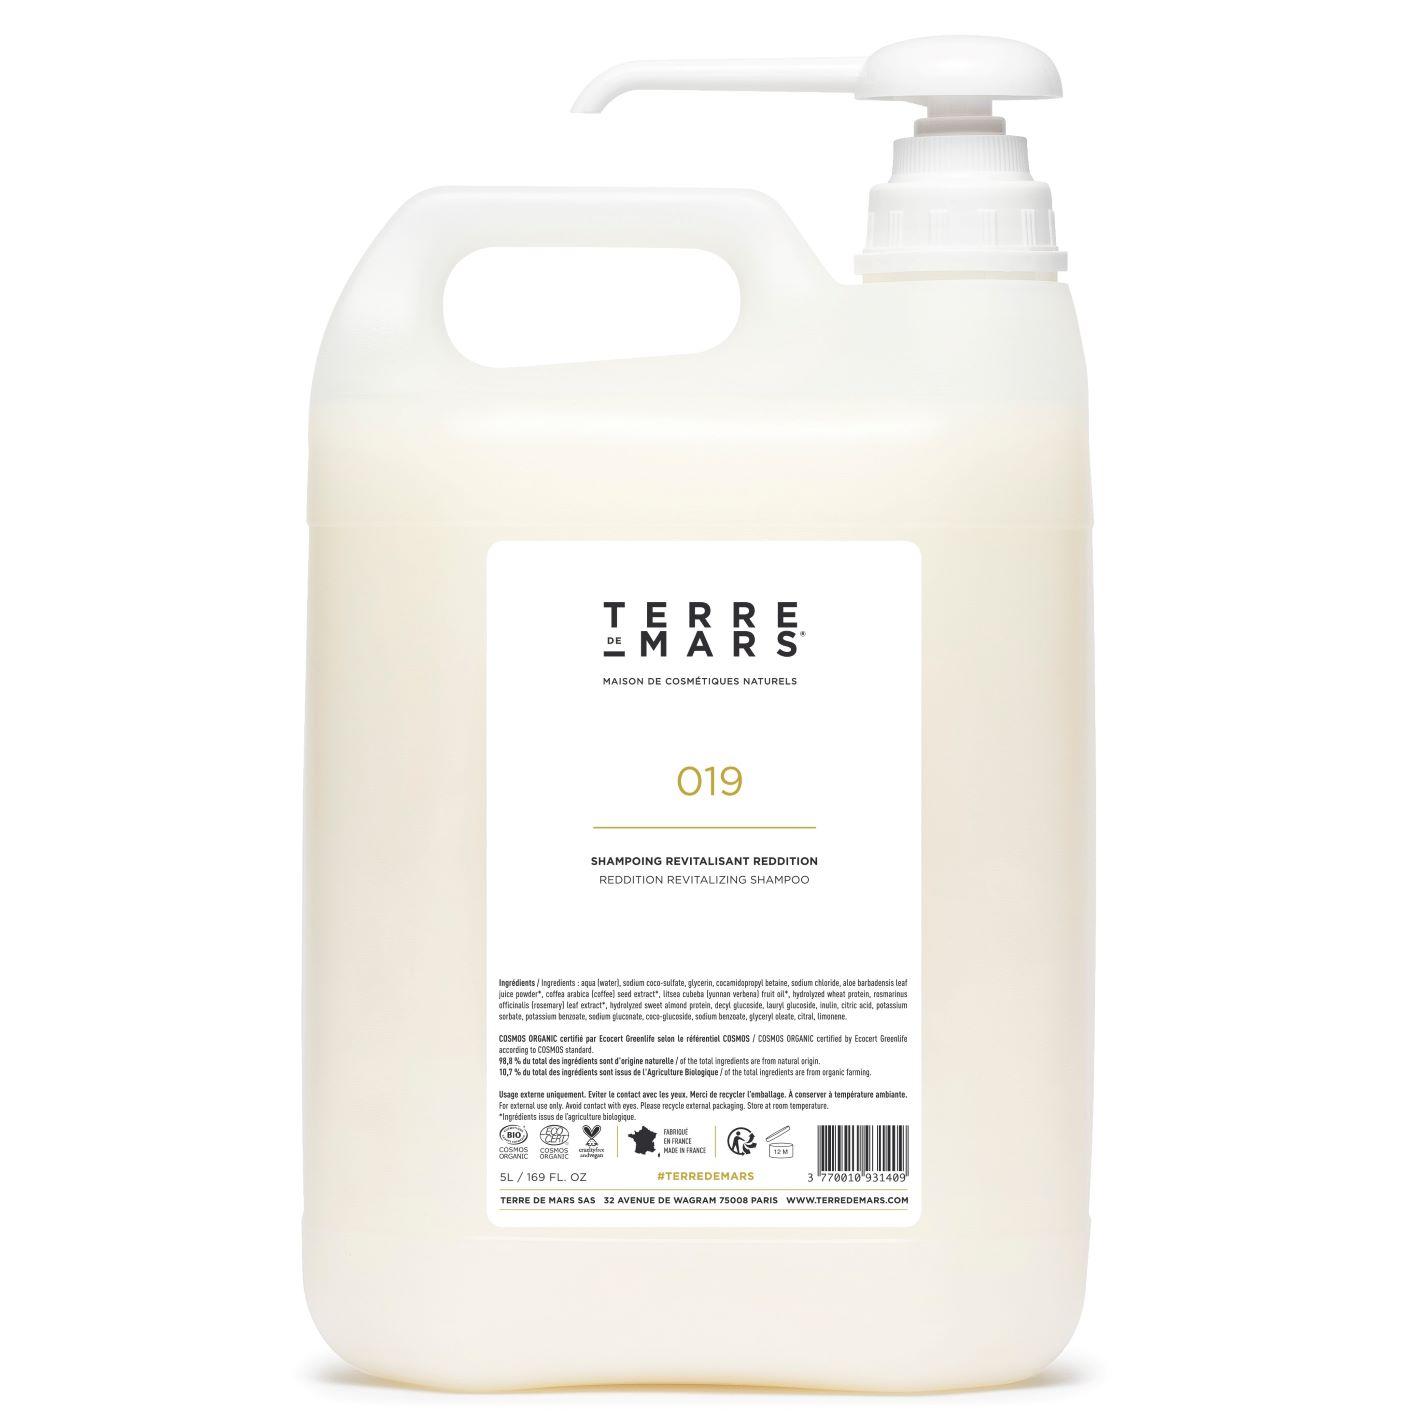 Terre-de-mars-019-shampoing-reddition-5000ml